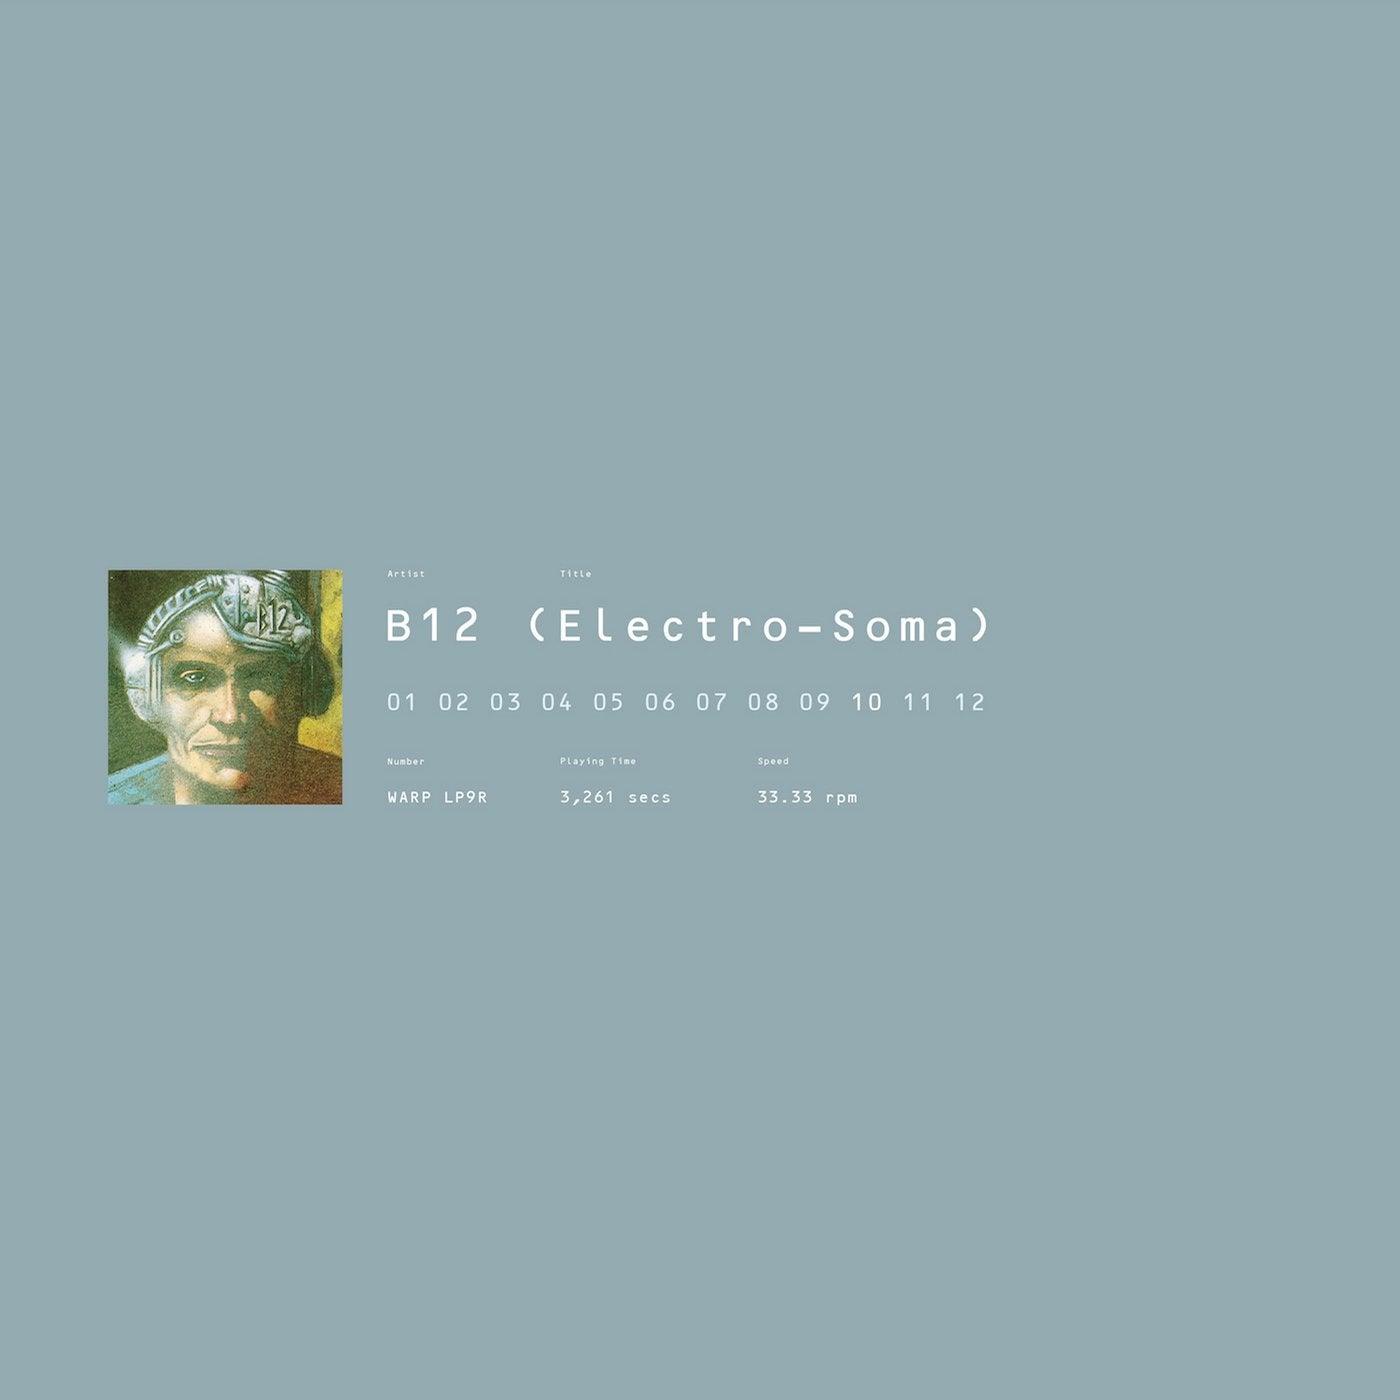 Telefone 529 (Original Mix)